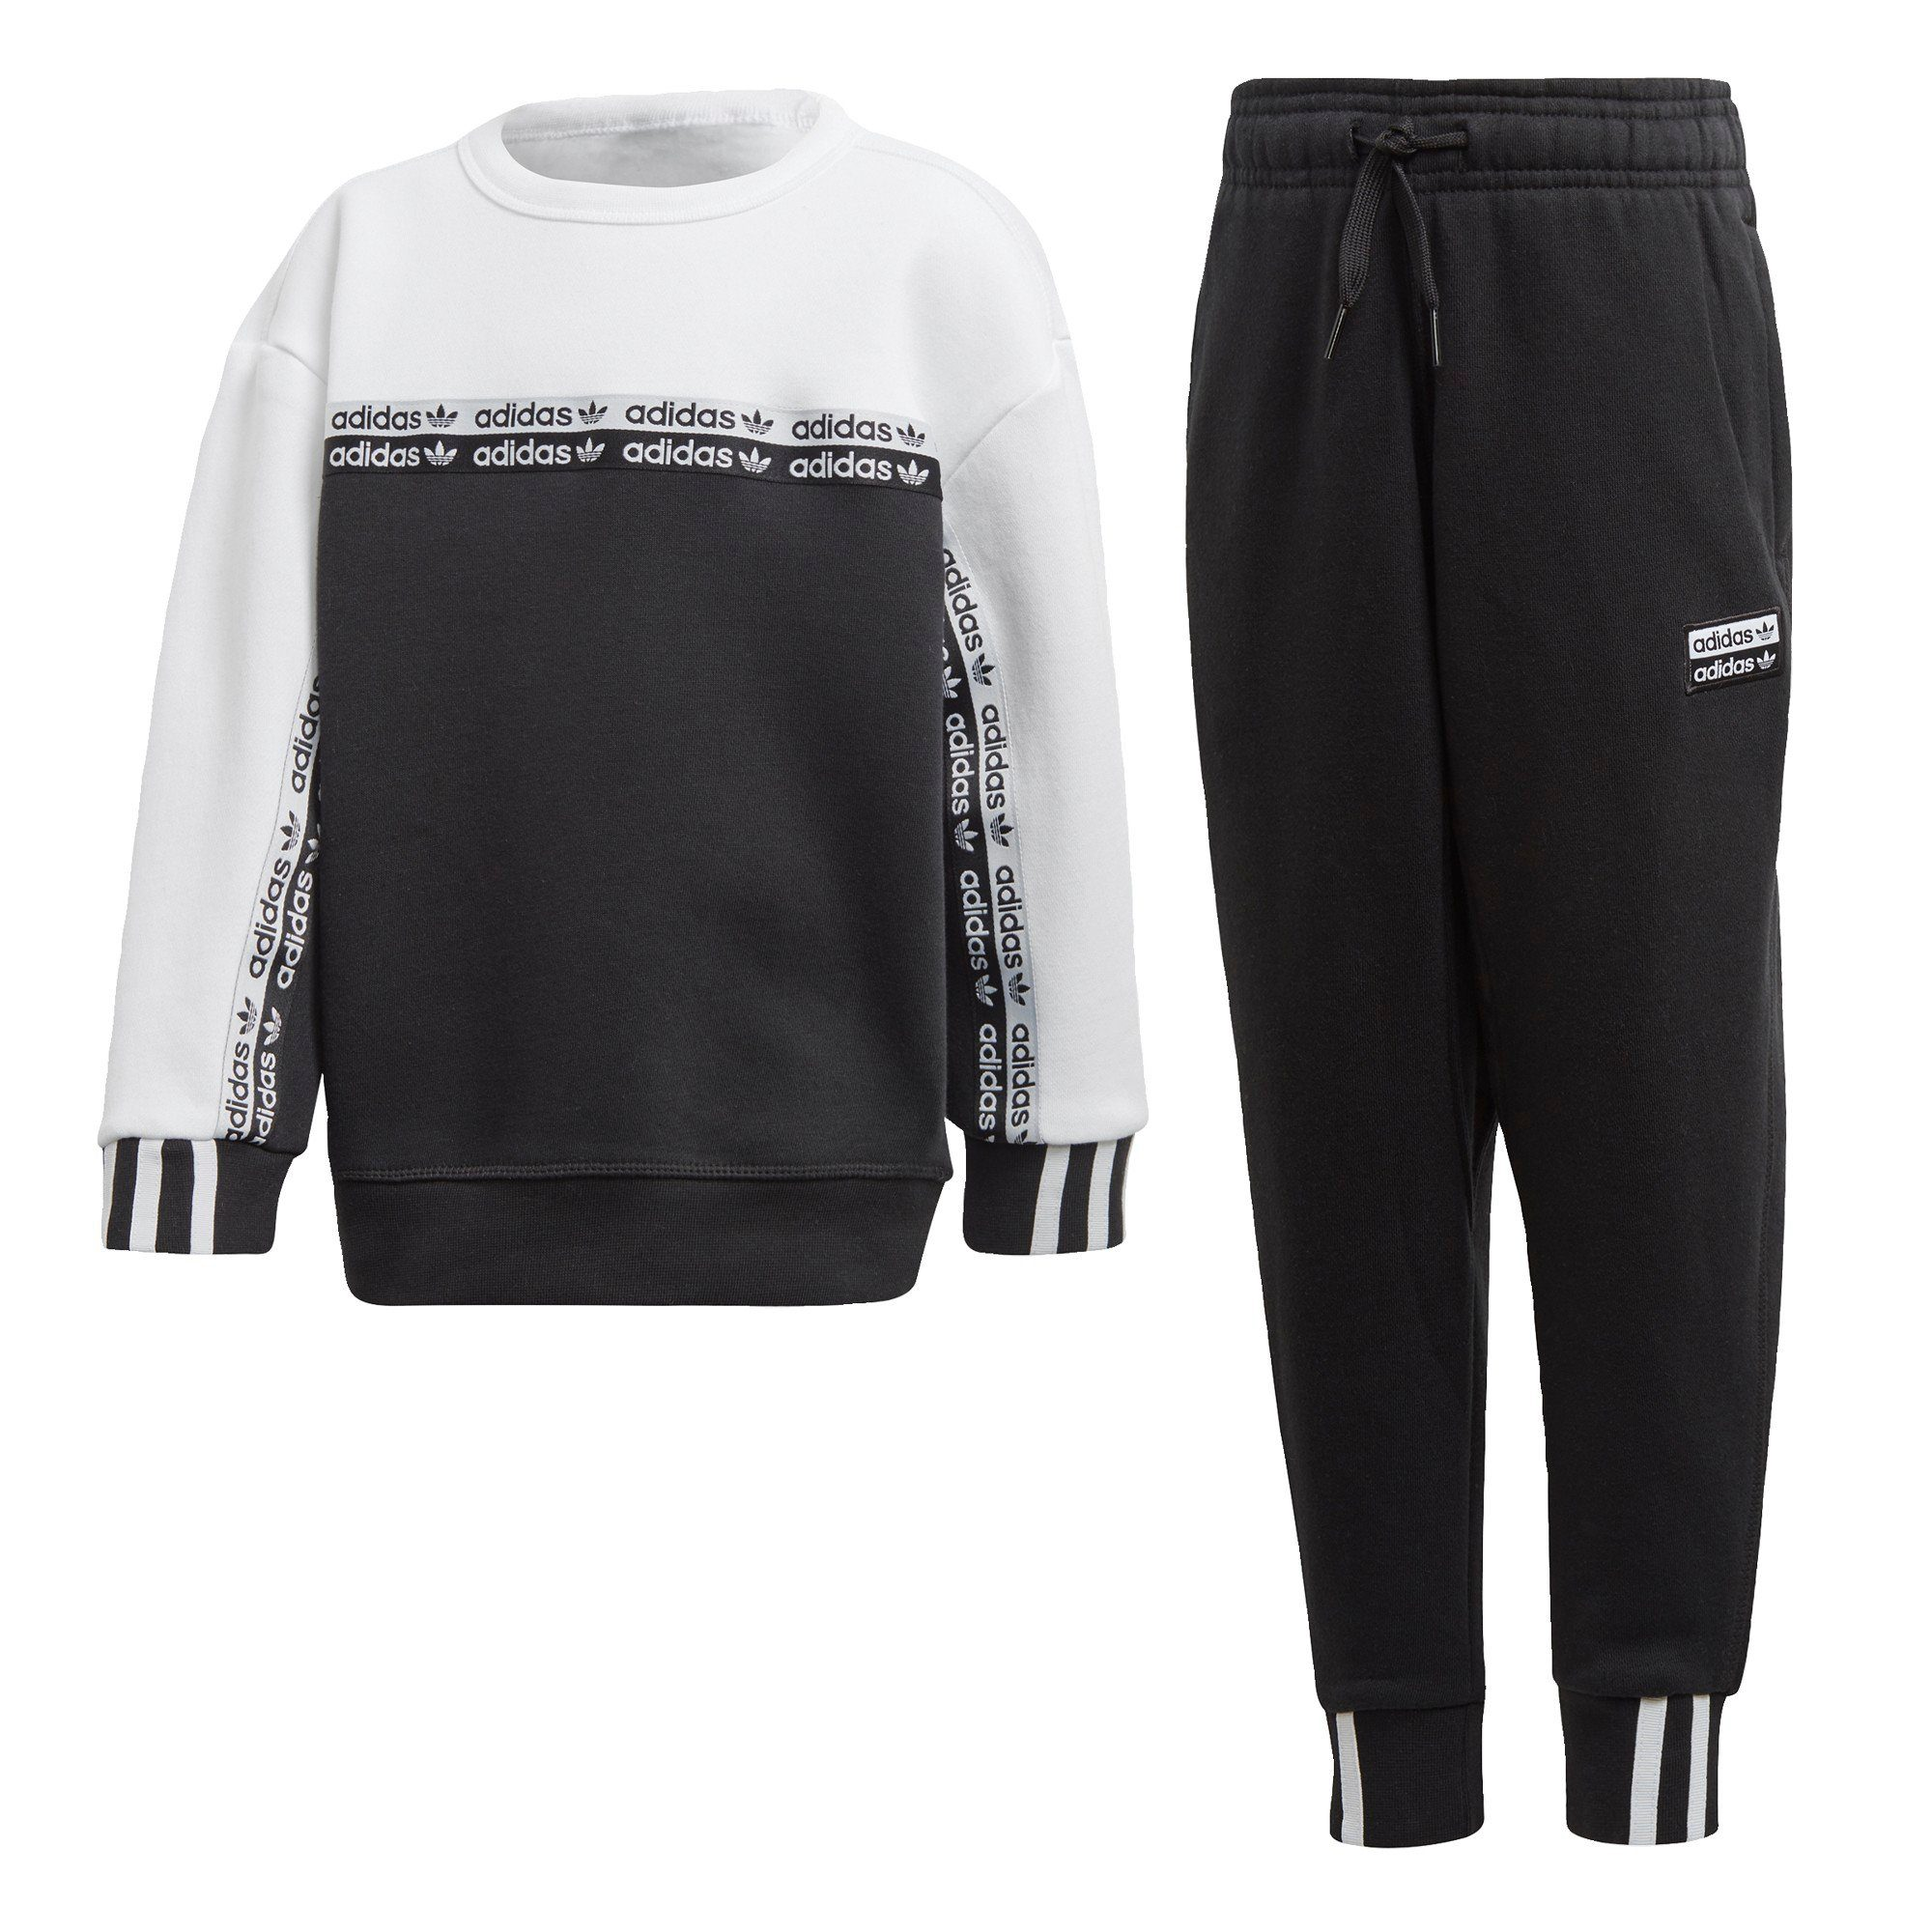 Adidas Trio Trainingsanzug blackwhite ab 49,99